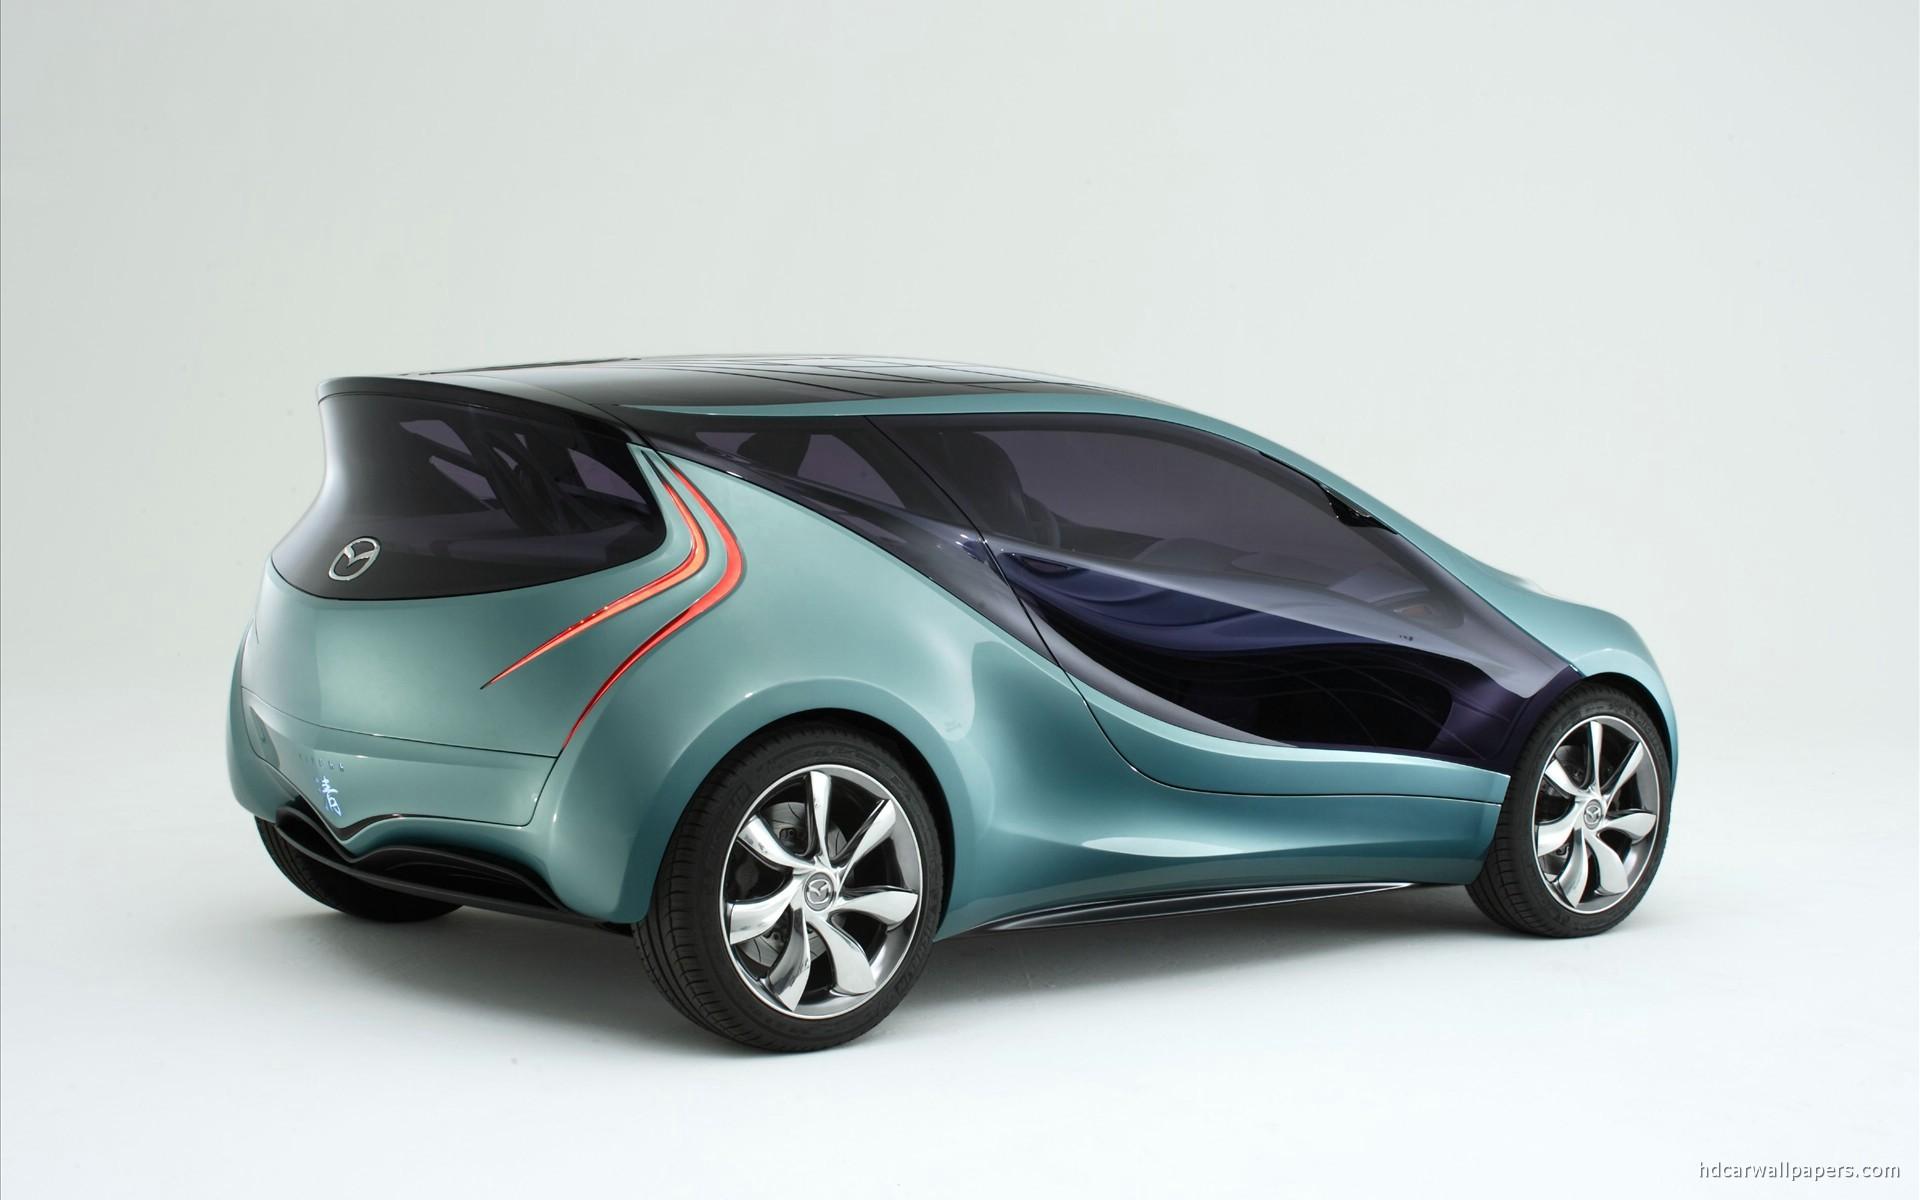 2010 mazda sky concept 2 wallpaper hd car wallpapers. Black Bedroom Furniture Sets. Home Design Ideas